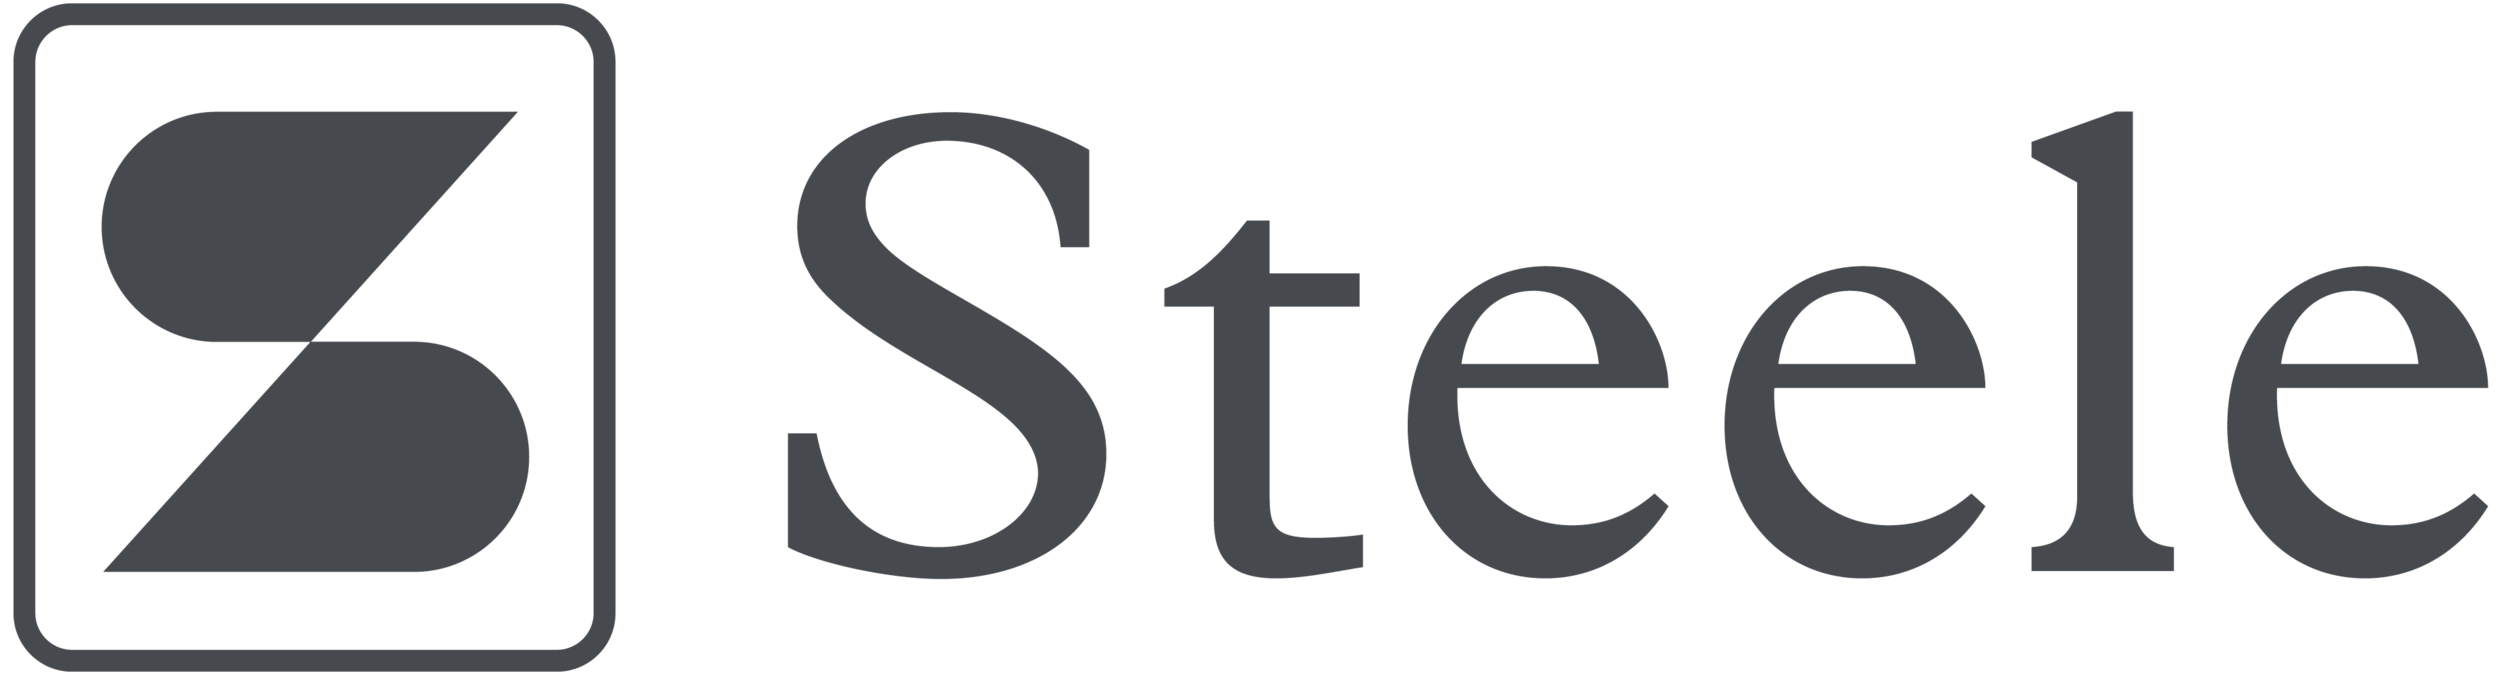 SteeleLogo.png